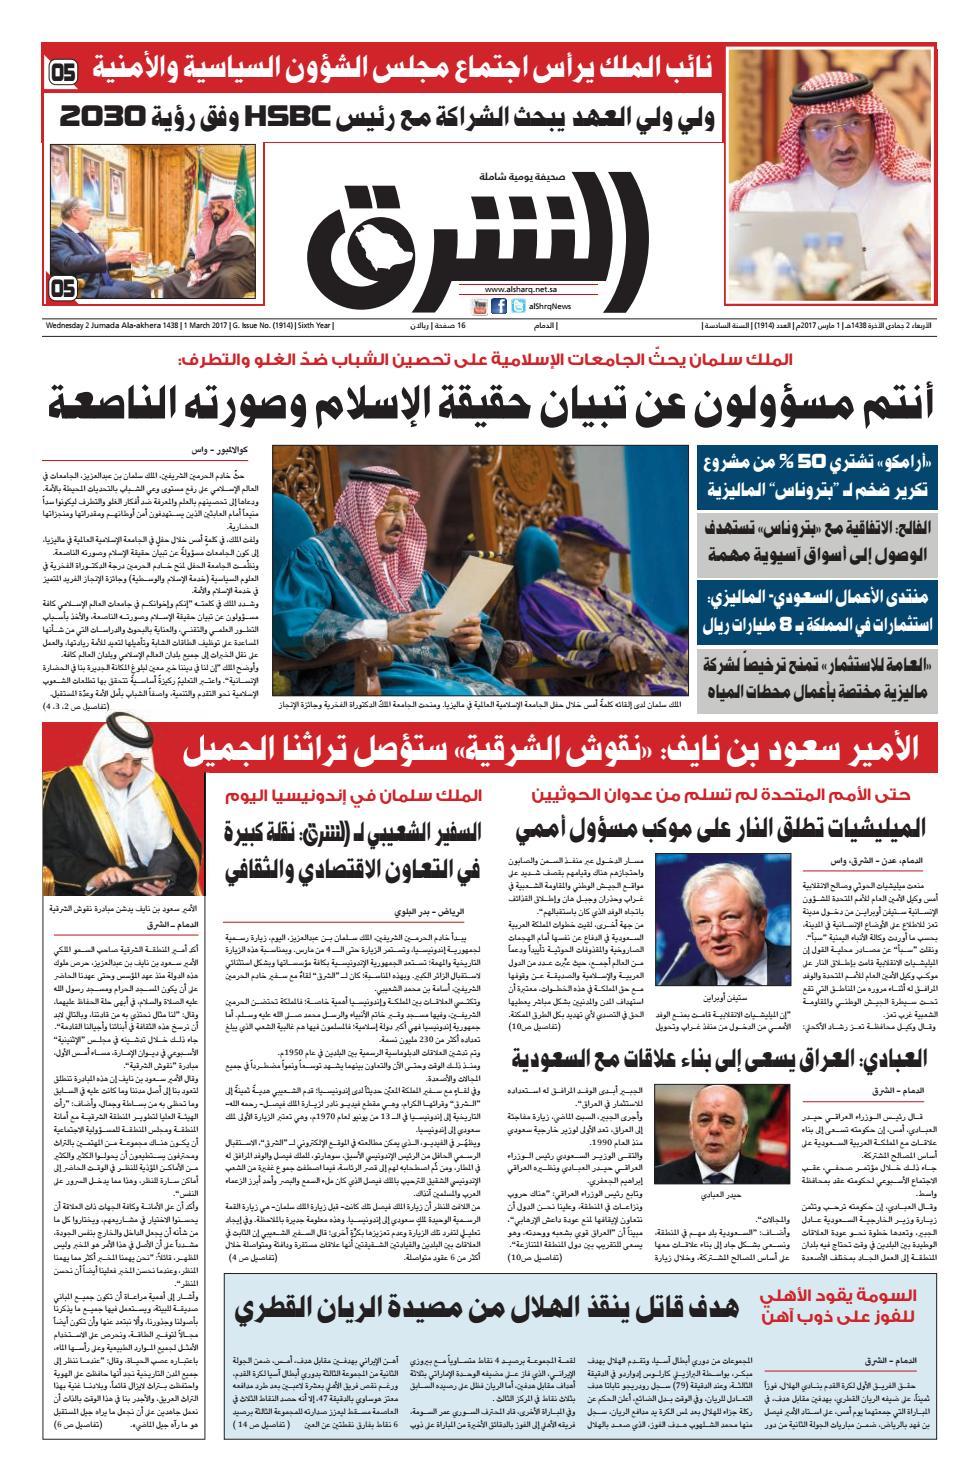 846713a43 صحيفة الشرق - العدد 1914 - نسخة الدمام by صحيفة الشرق السعودية - issuu